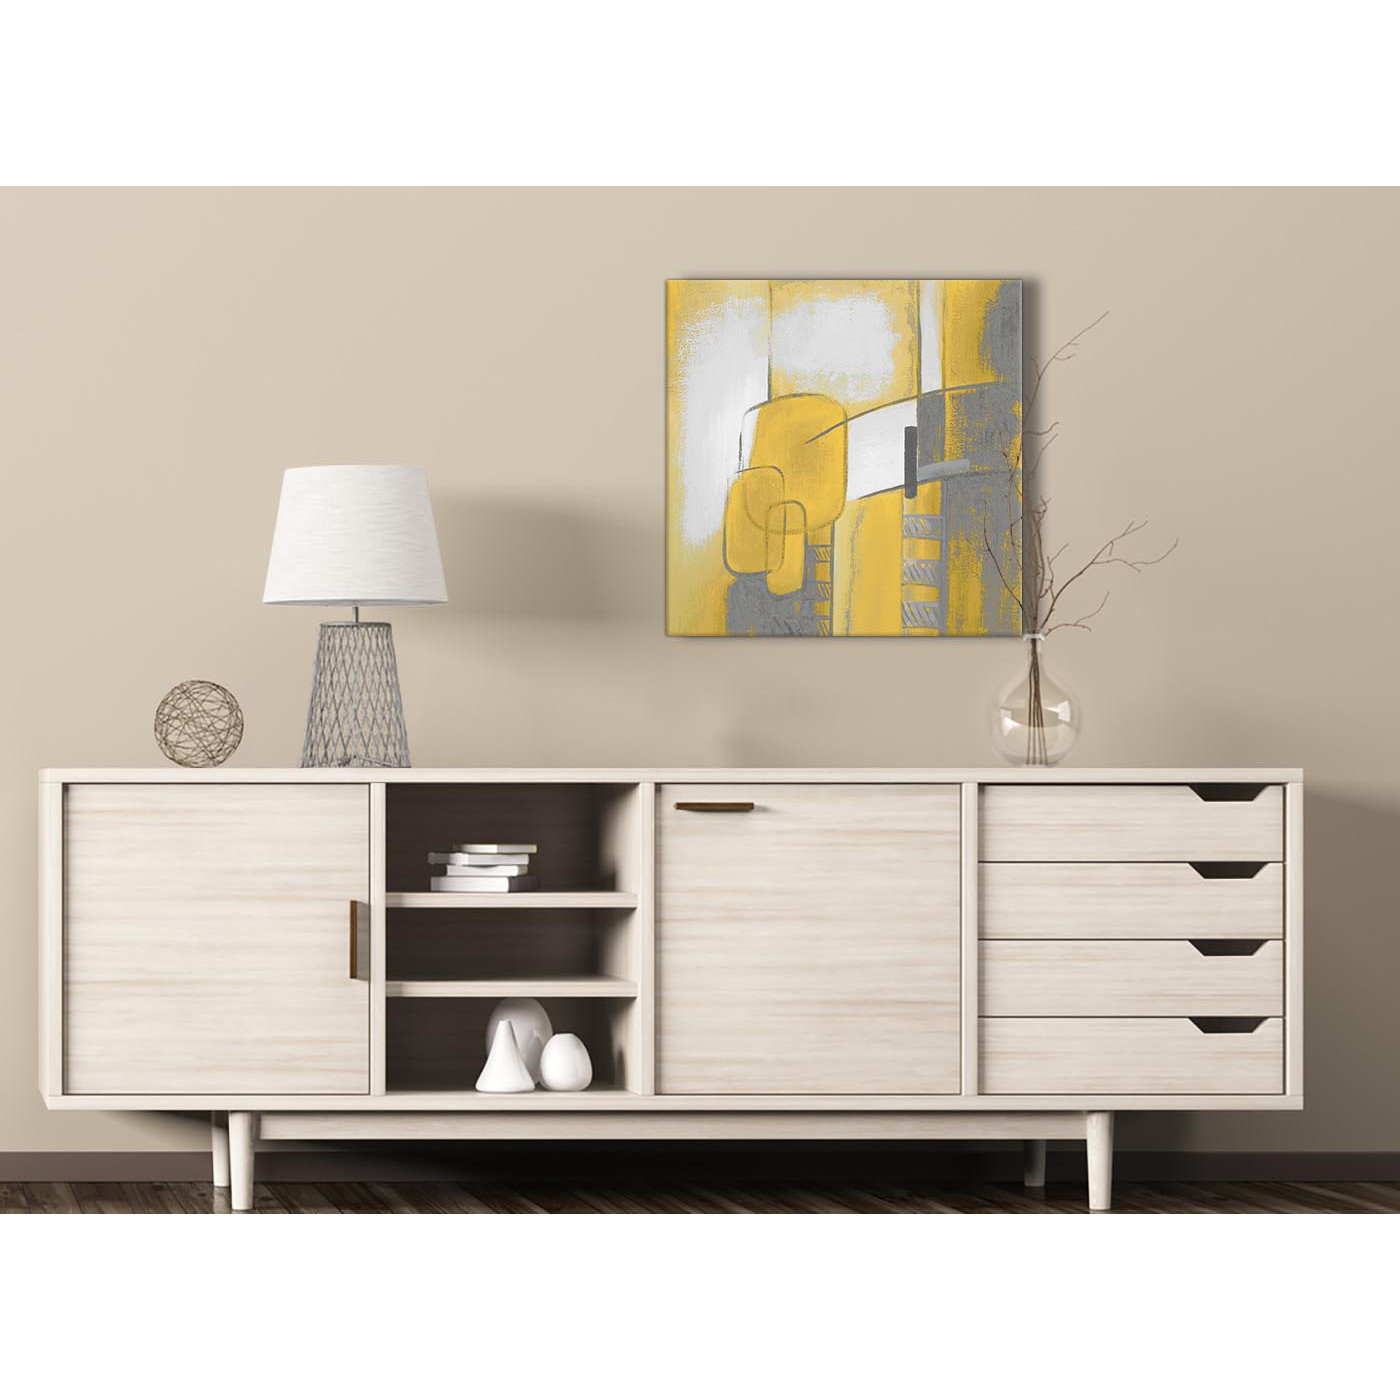 Mustard Yellow Kitchen Decor: Mustard Yellow Grey Painting Hallway Canvas Wall Art Decor